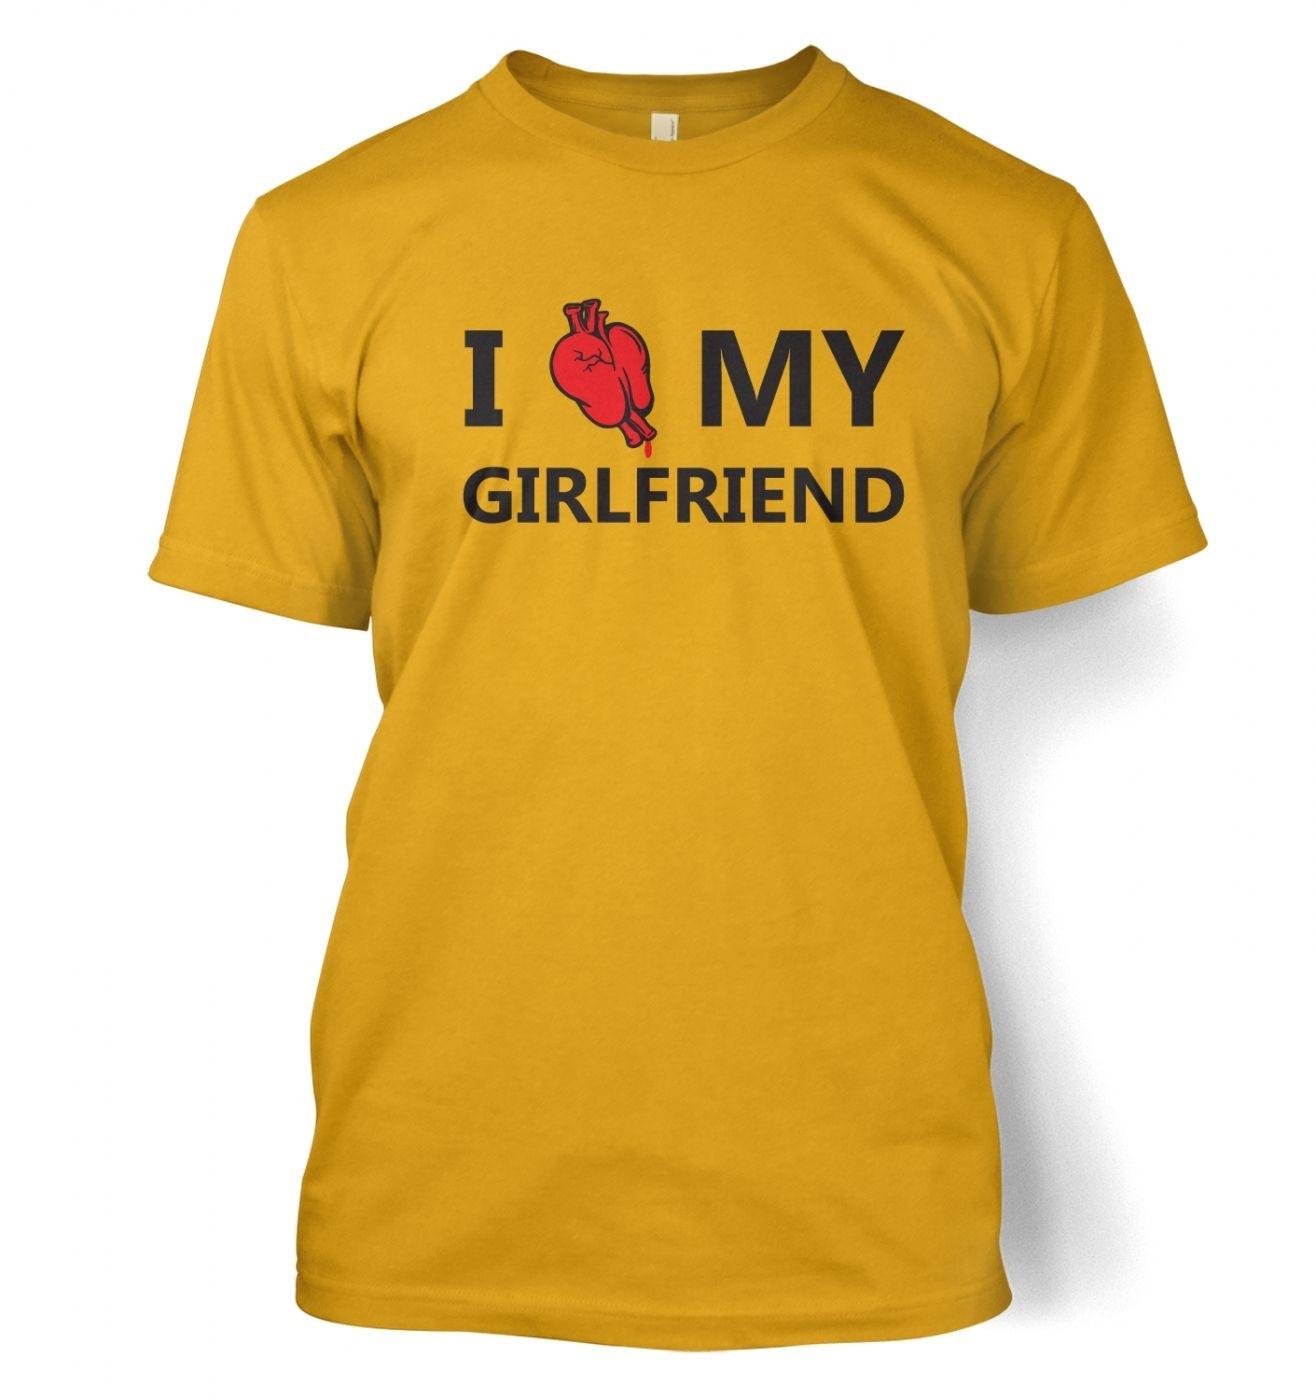 I real heart my girlfriend t-shirt